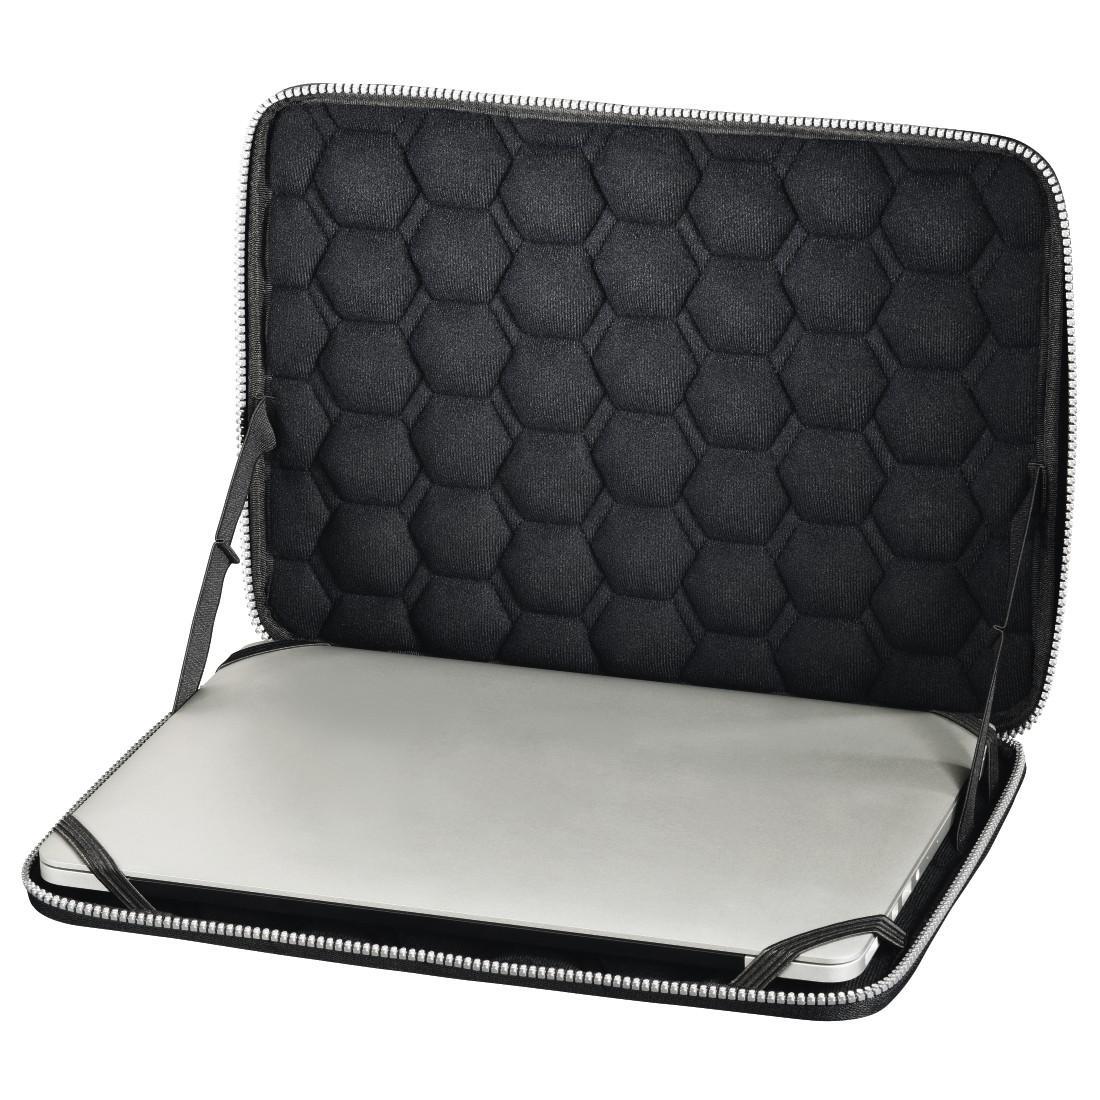 Универсален калъф за лаптоп HAMA Protection, до 34 см  (13.3),  удароустойчив, пластмасов, Черен-2